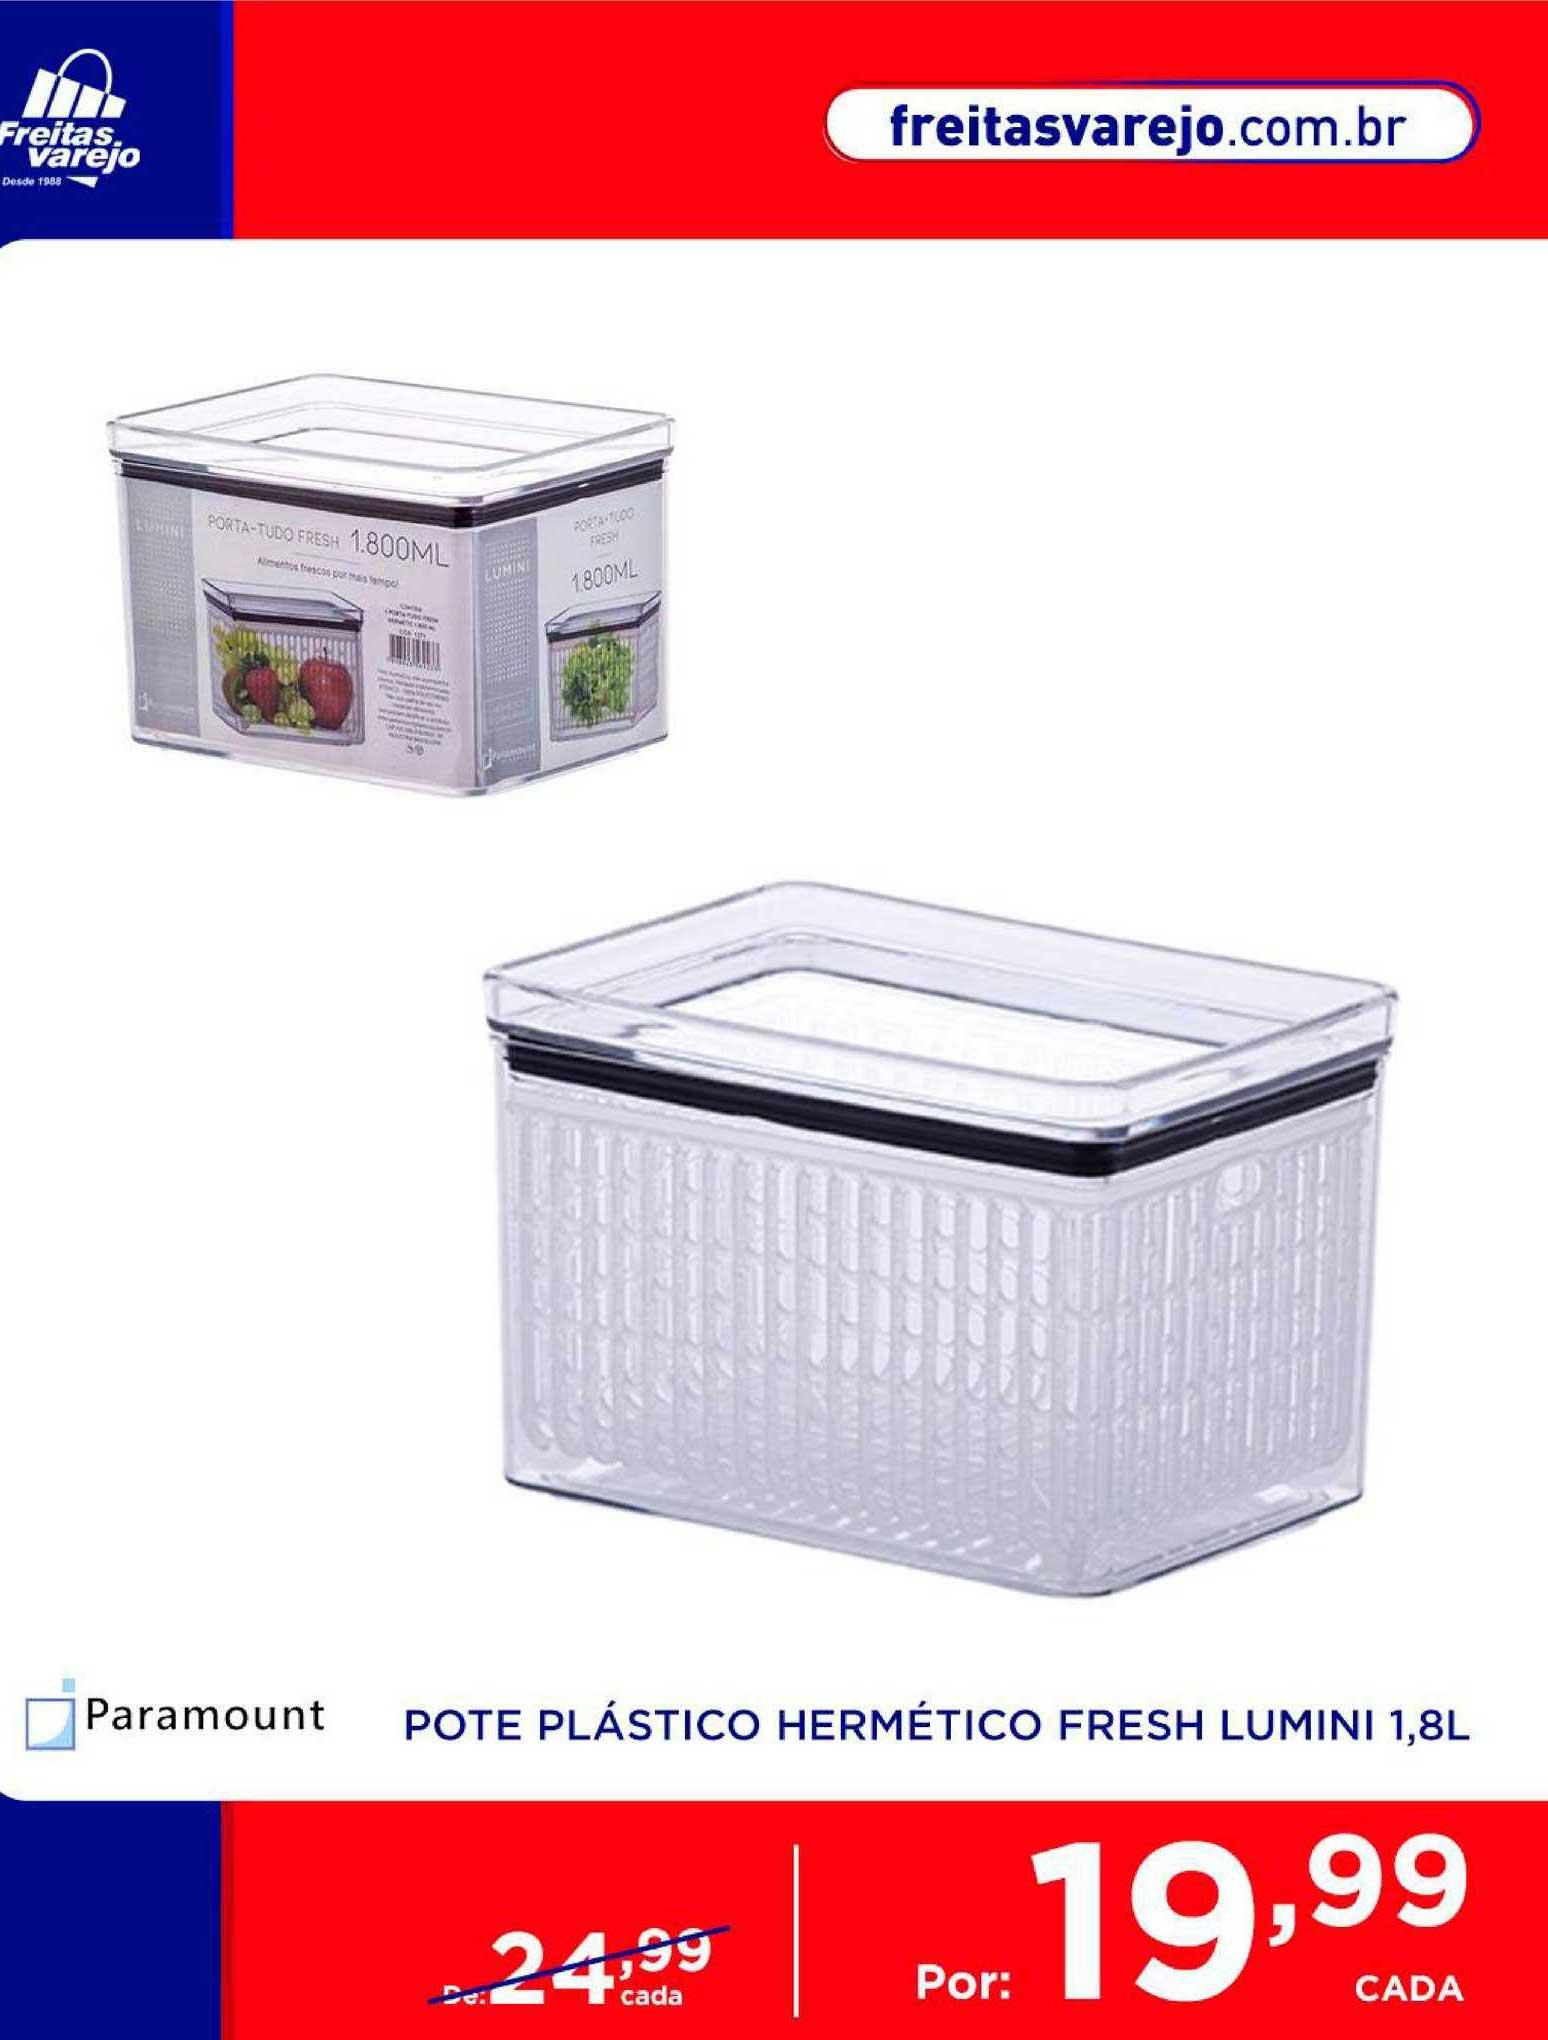 Freitas Varejo Pote Plástico Hermético Fresh Lumini